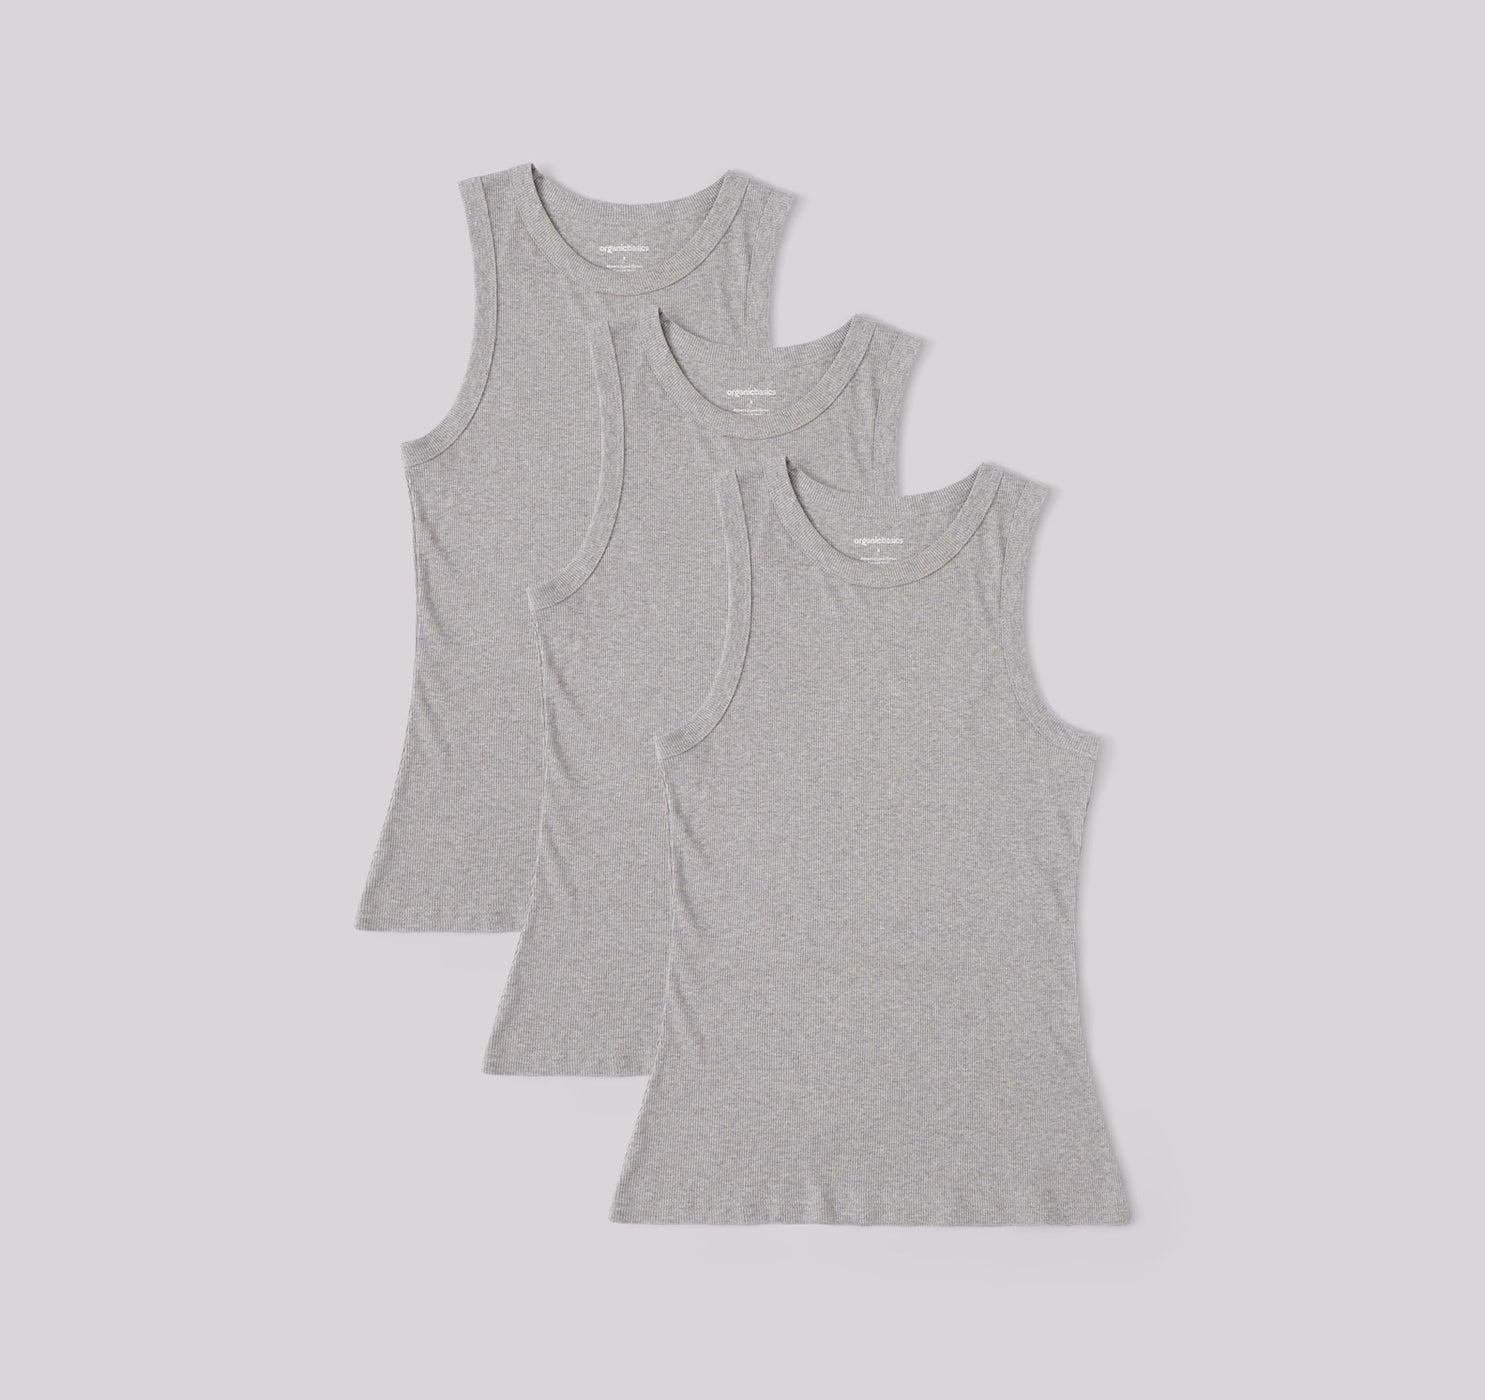 Organic Cotton Rib-Flex Tank Top 3-pack